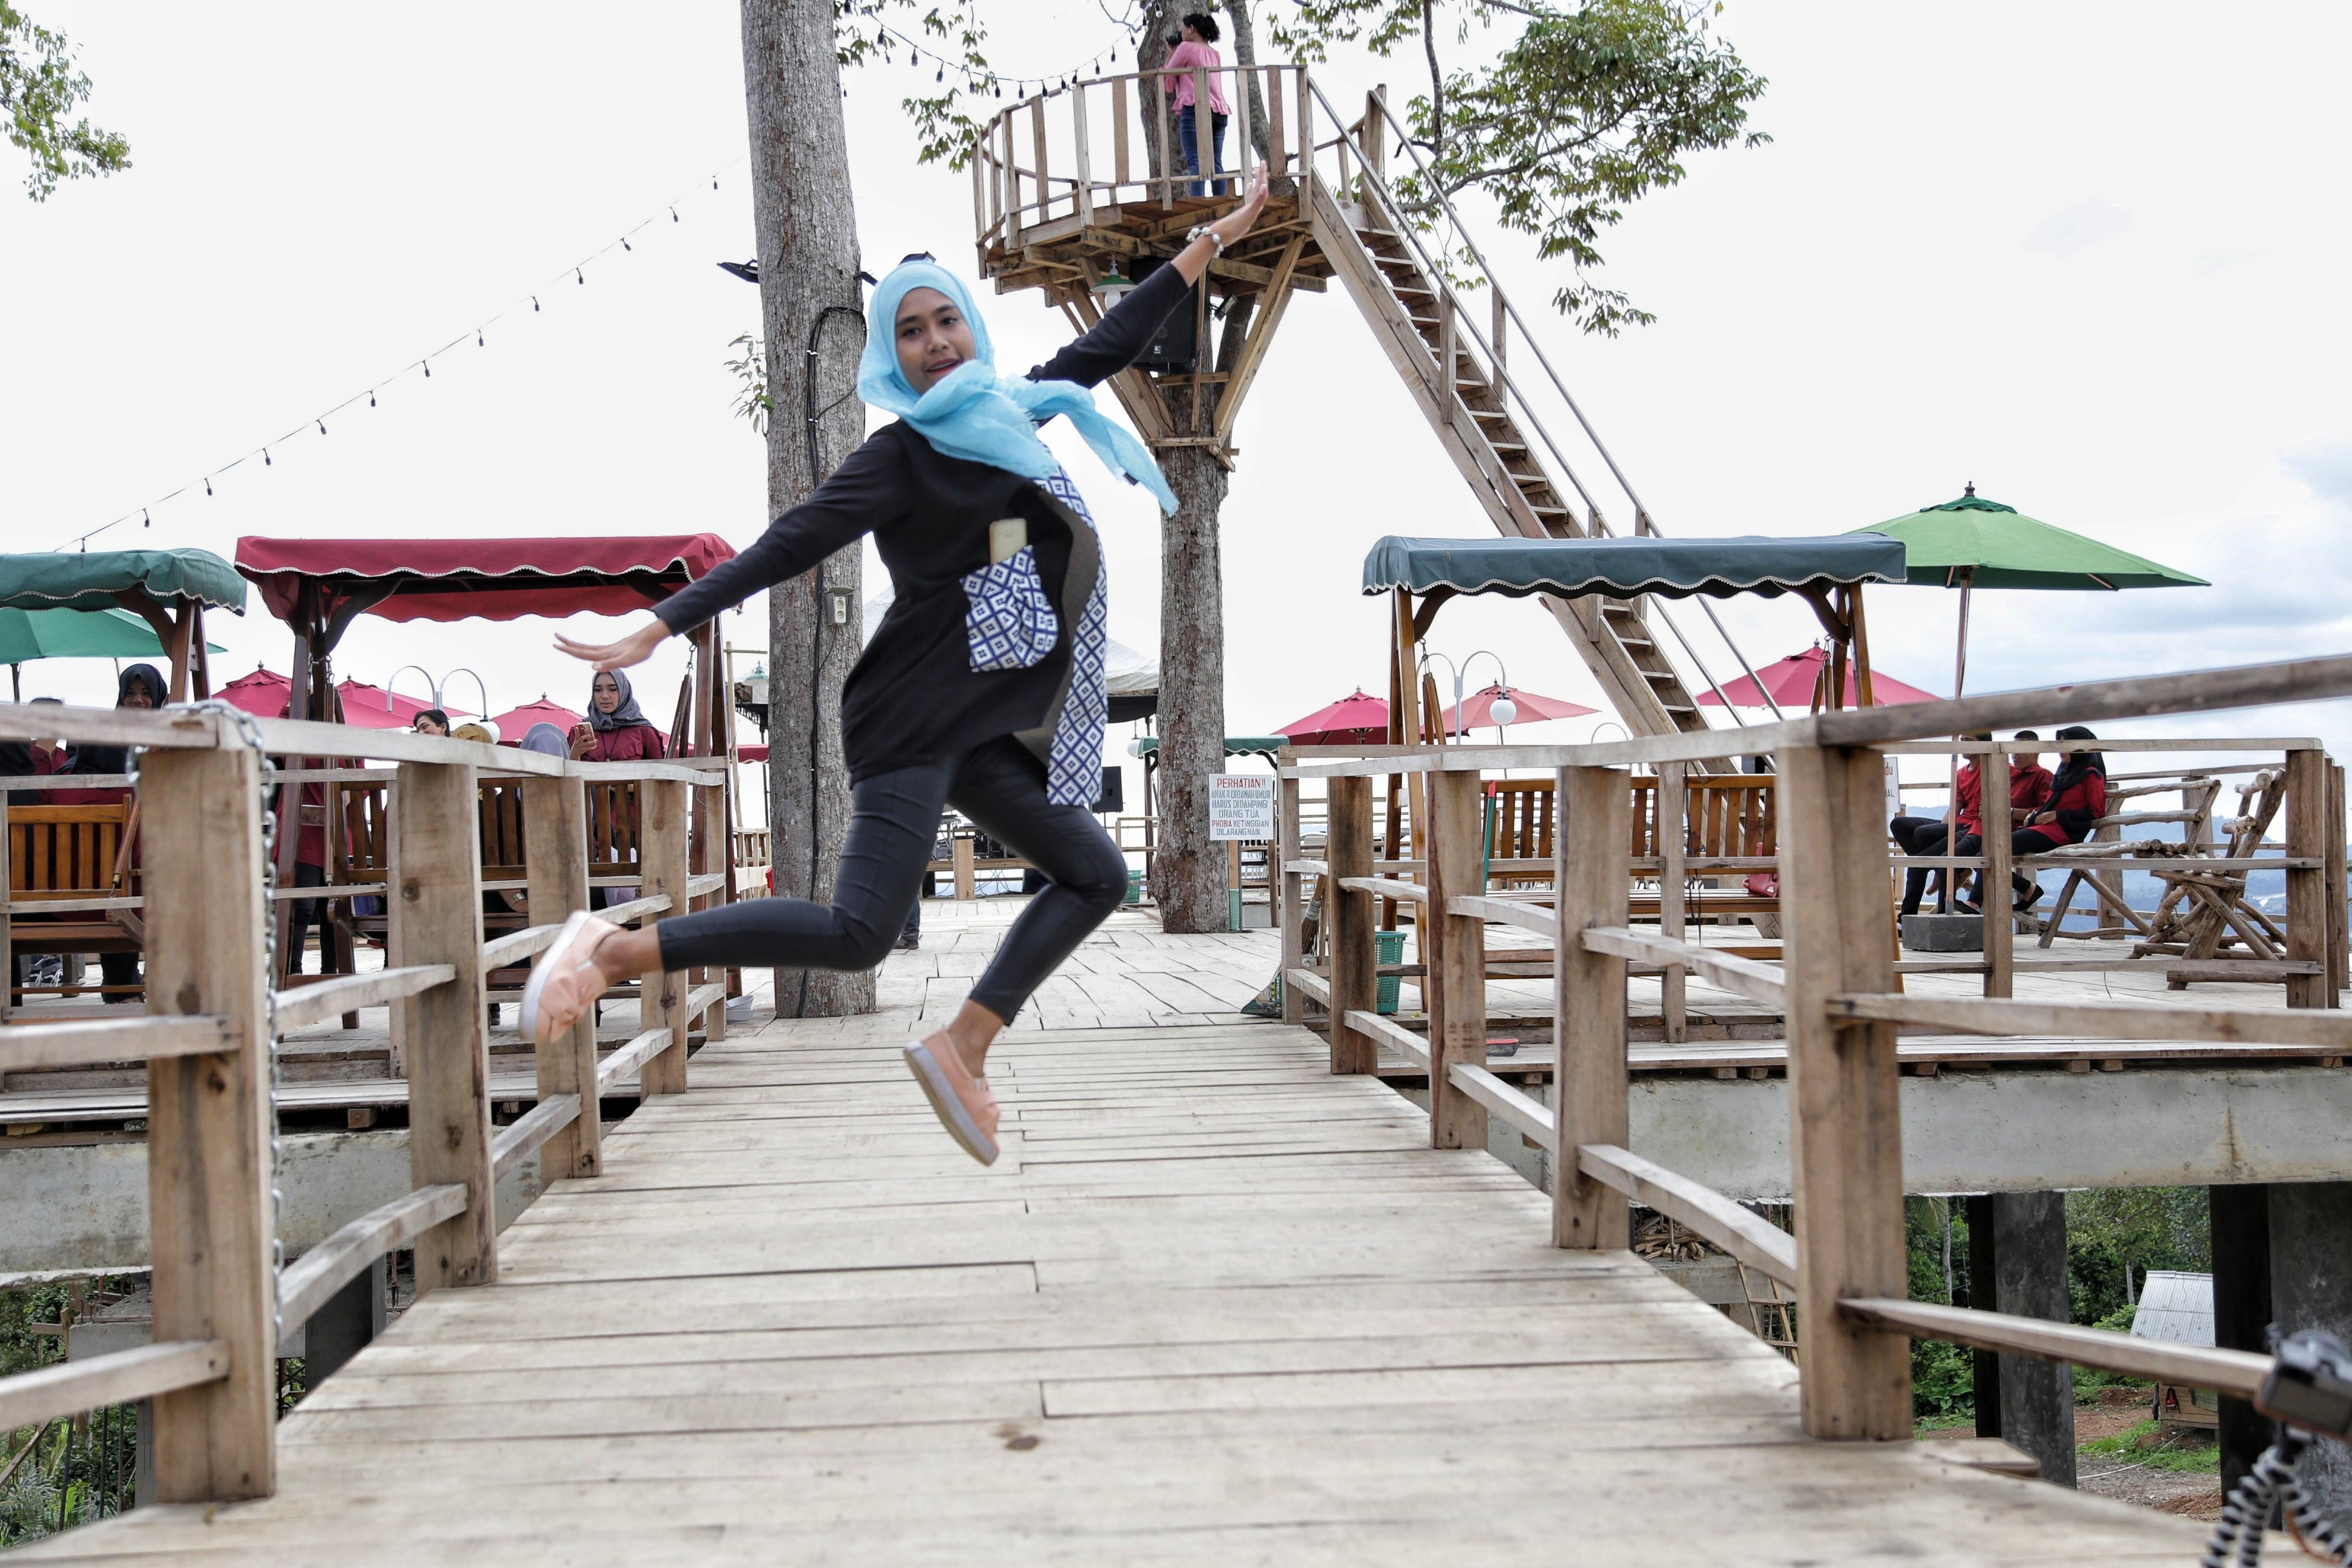 Puncak Mas Lampung Wisata Alam Budaya Indonesia Dunia Loncat Bergembira